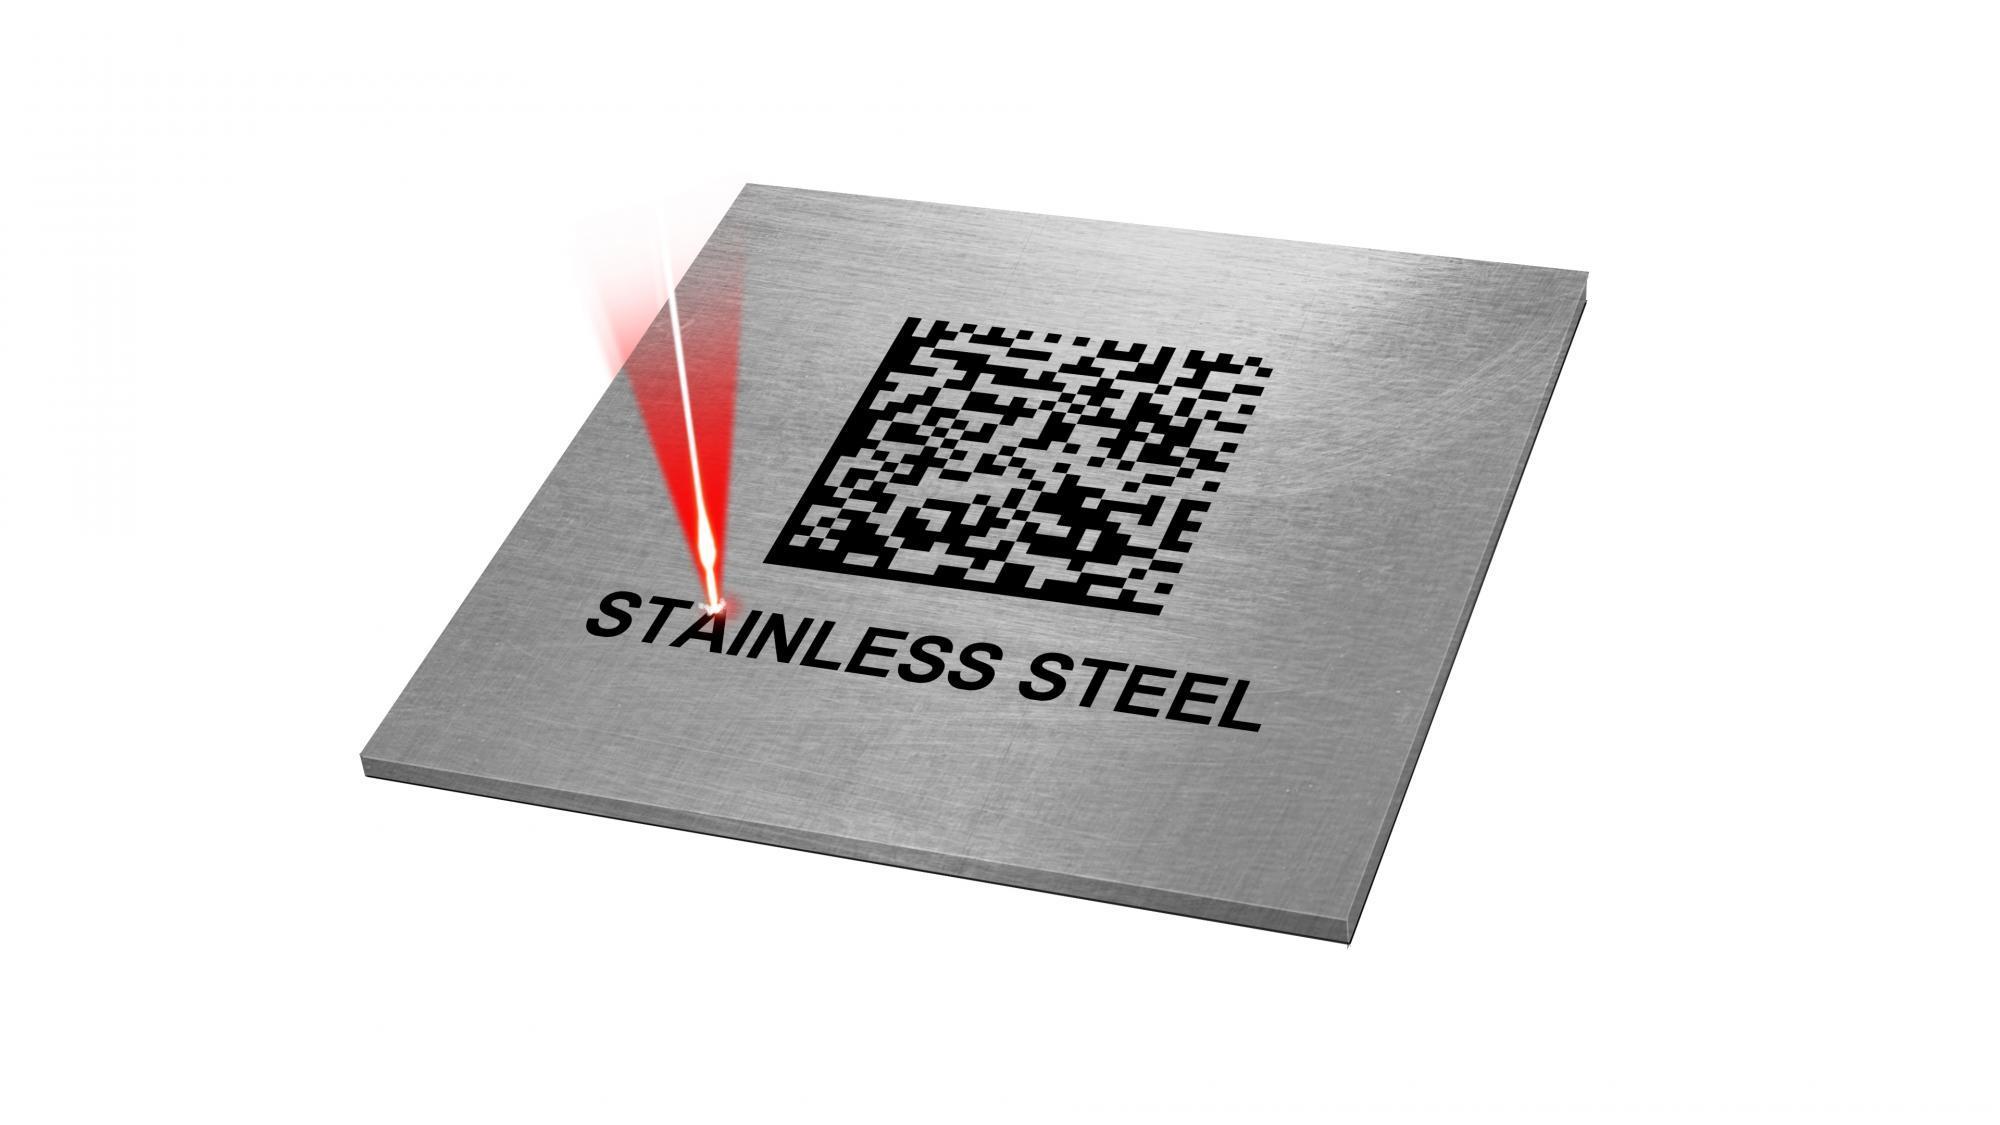 Laser Marking on Stainless Steel